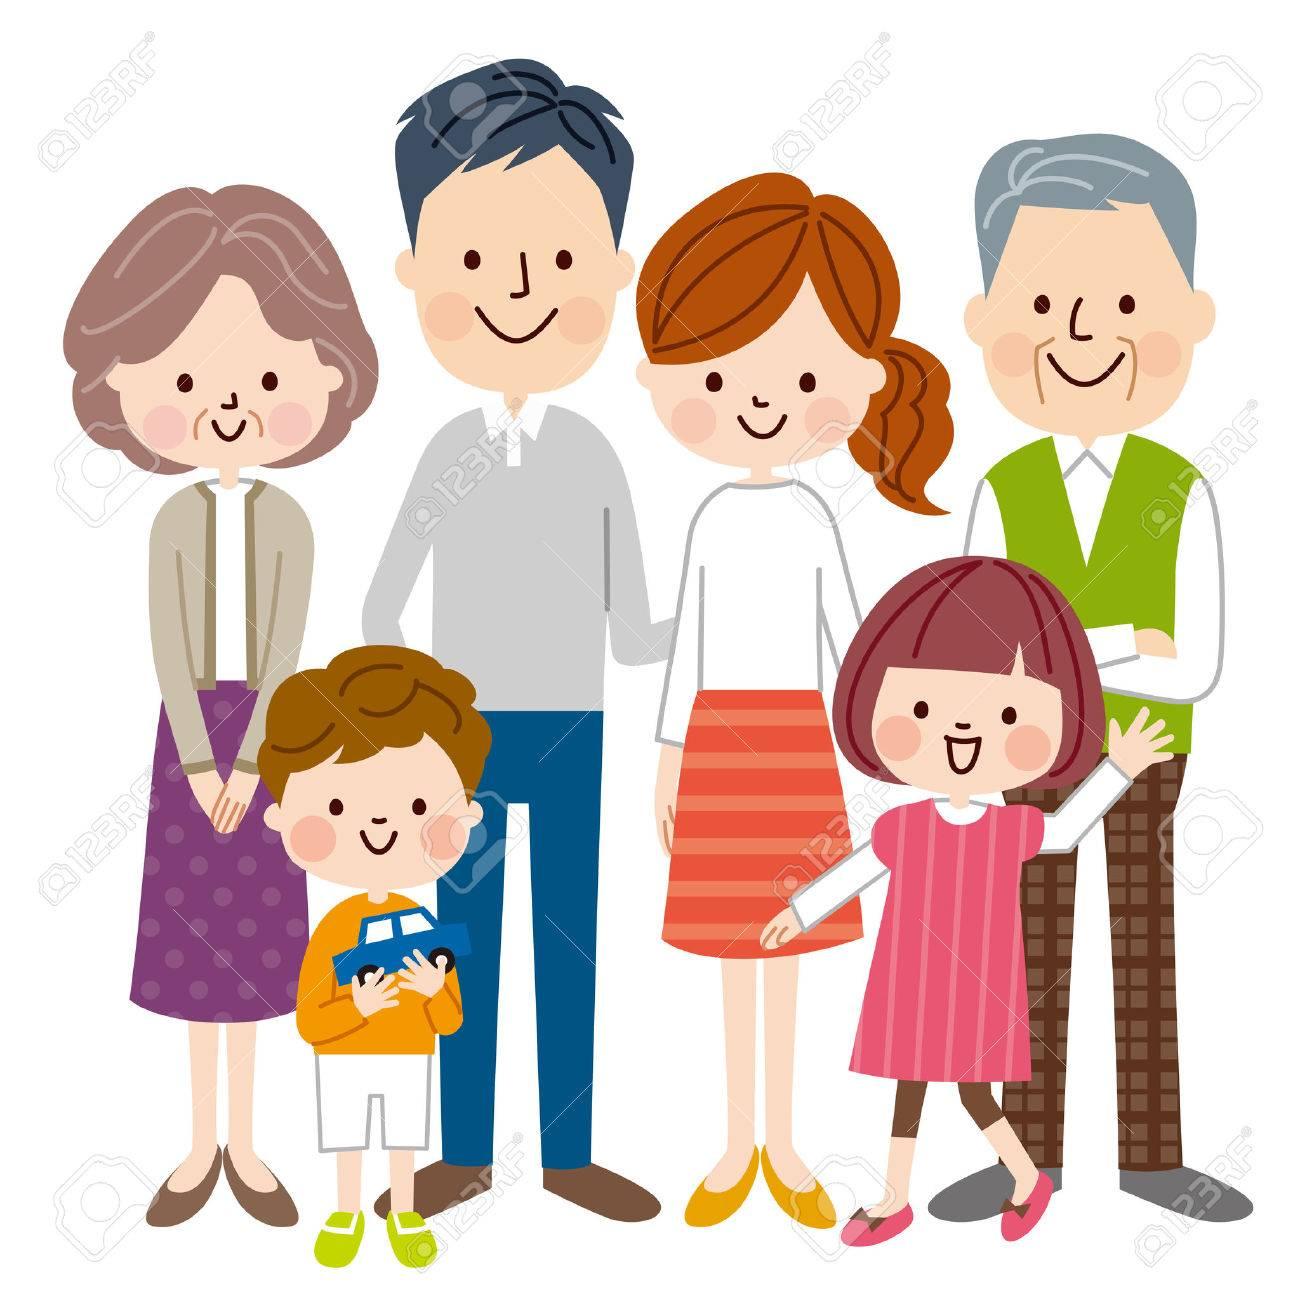 Family - 50903438